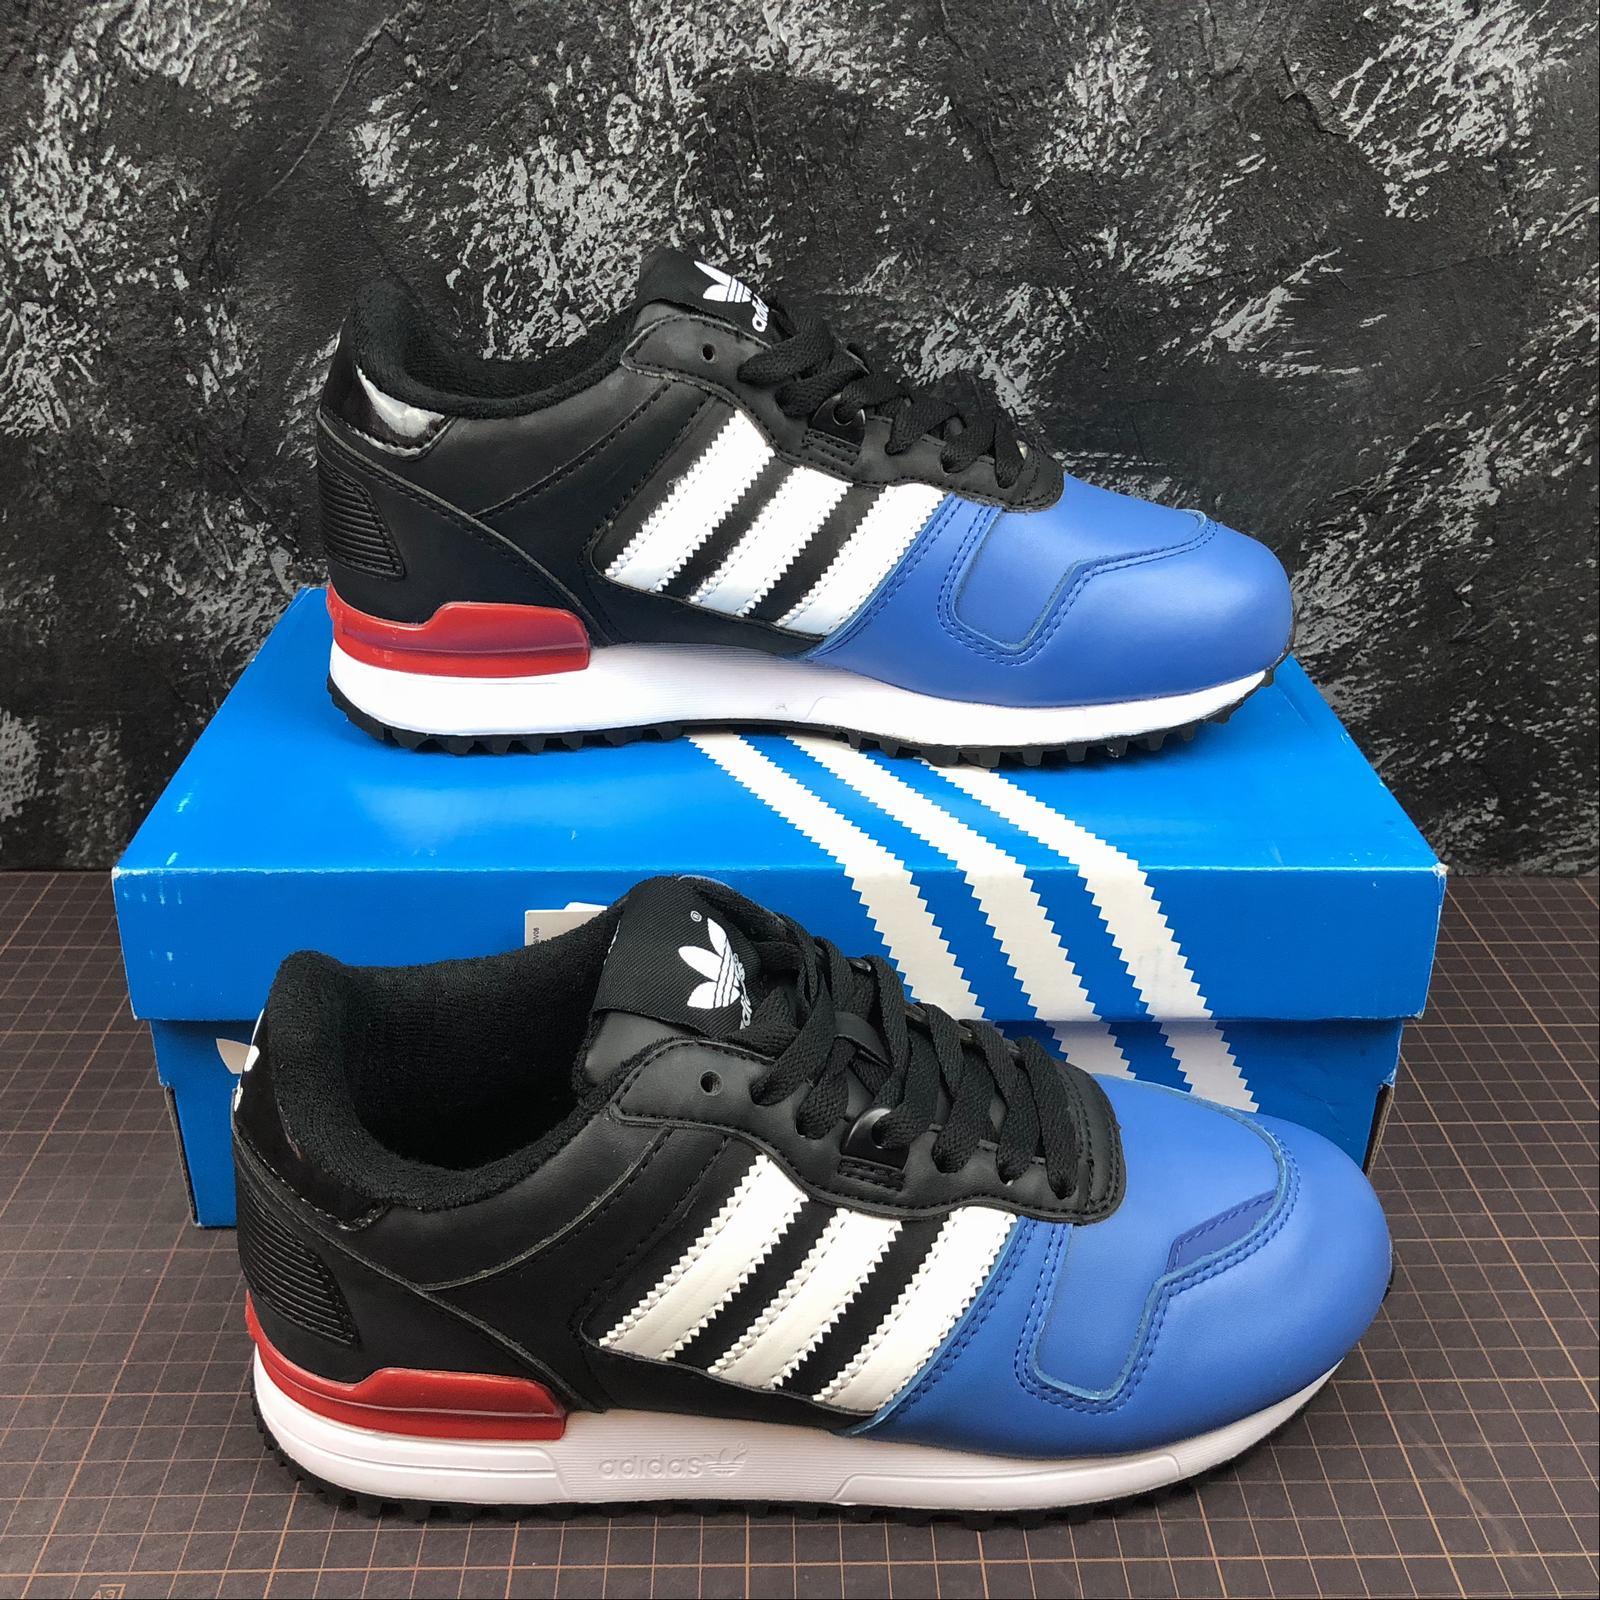 giay-sneaker-adidas-zx700-aq5315